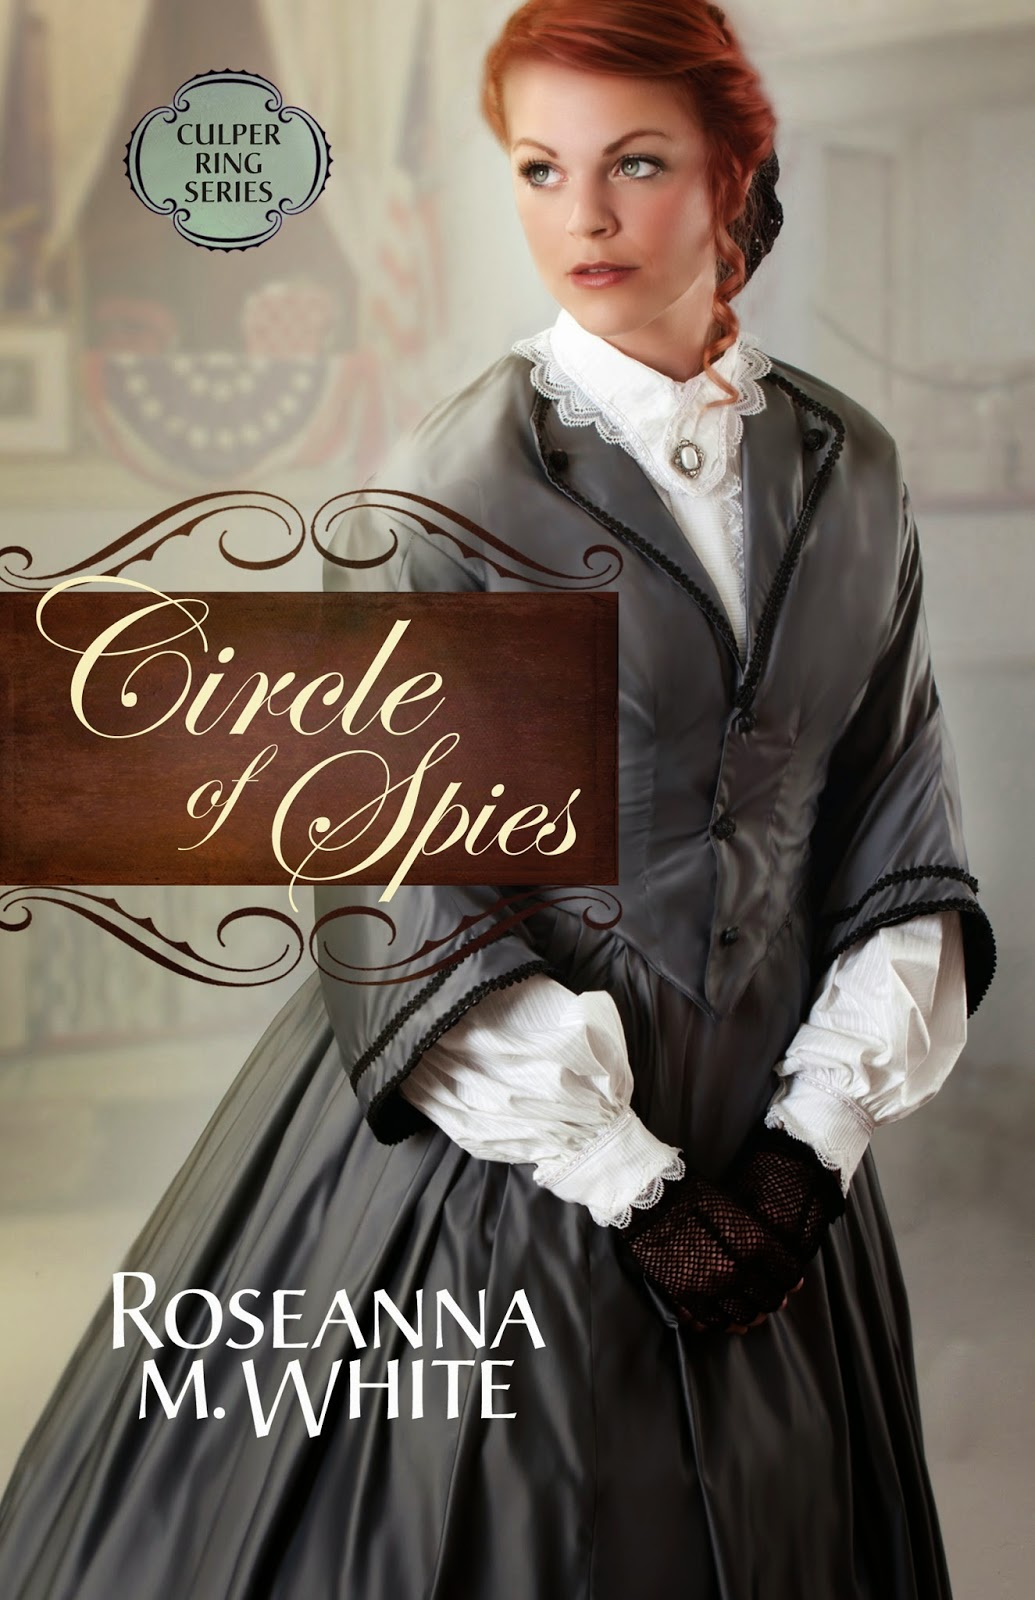 http://roseannamwhite.blogspot.com/p/blog-page_9753.html